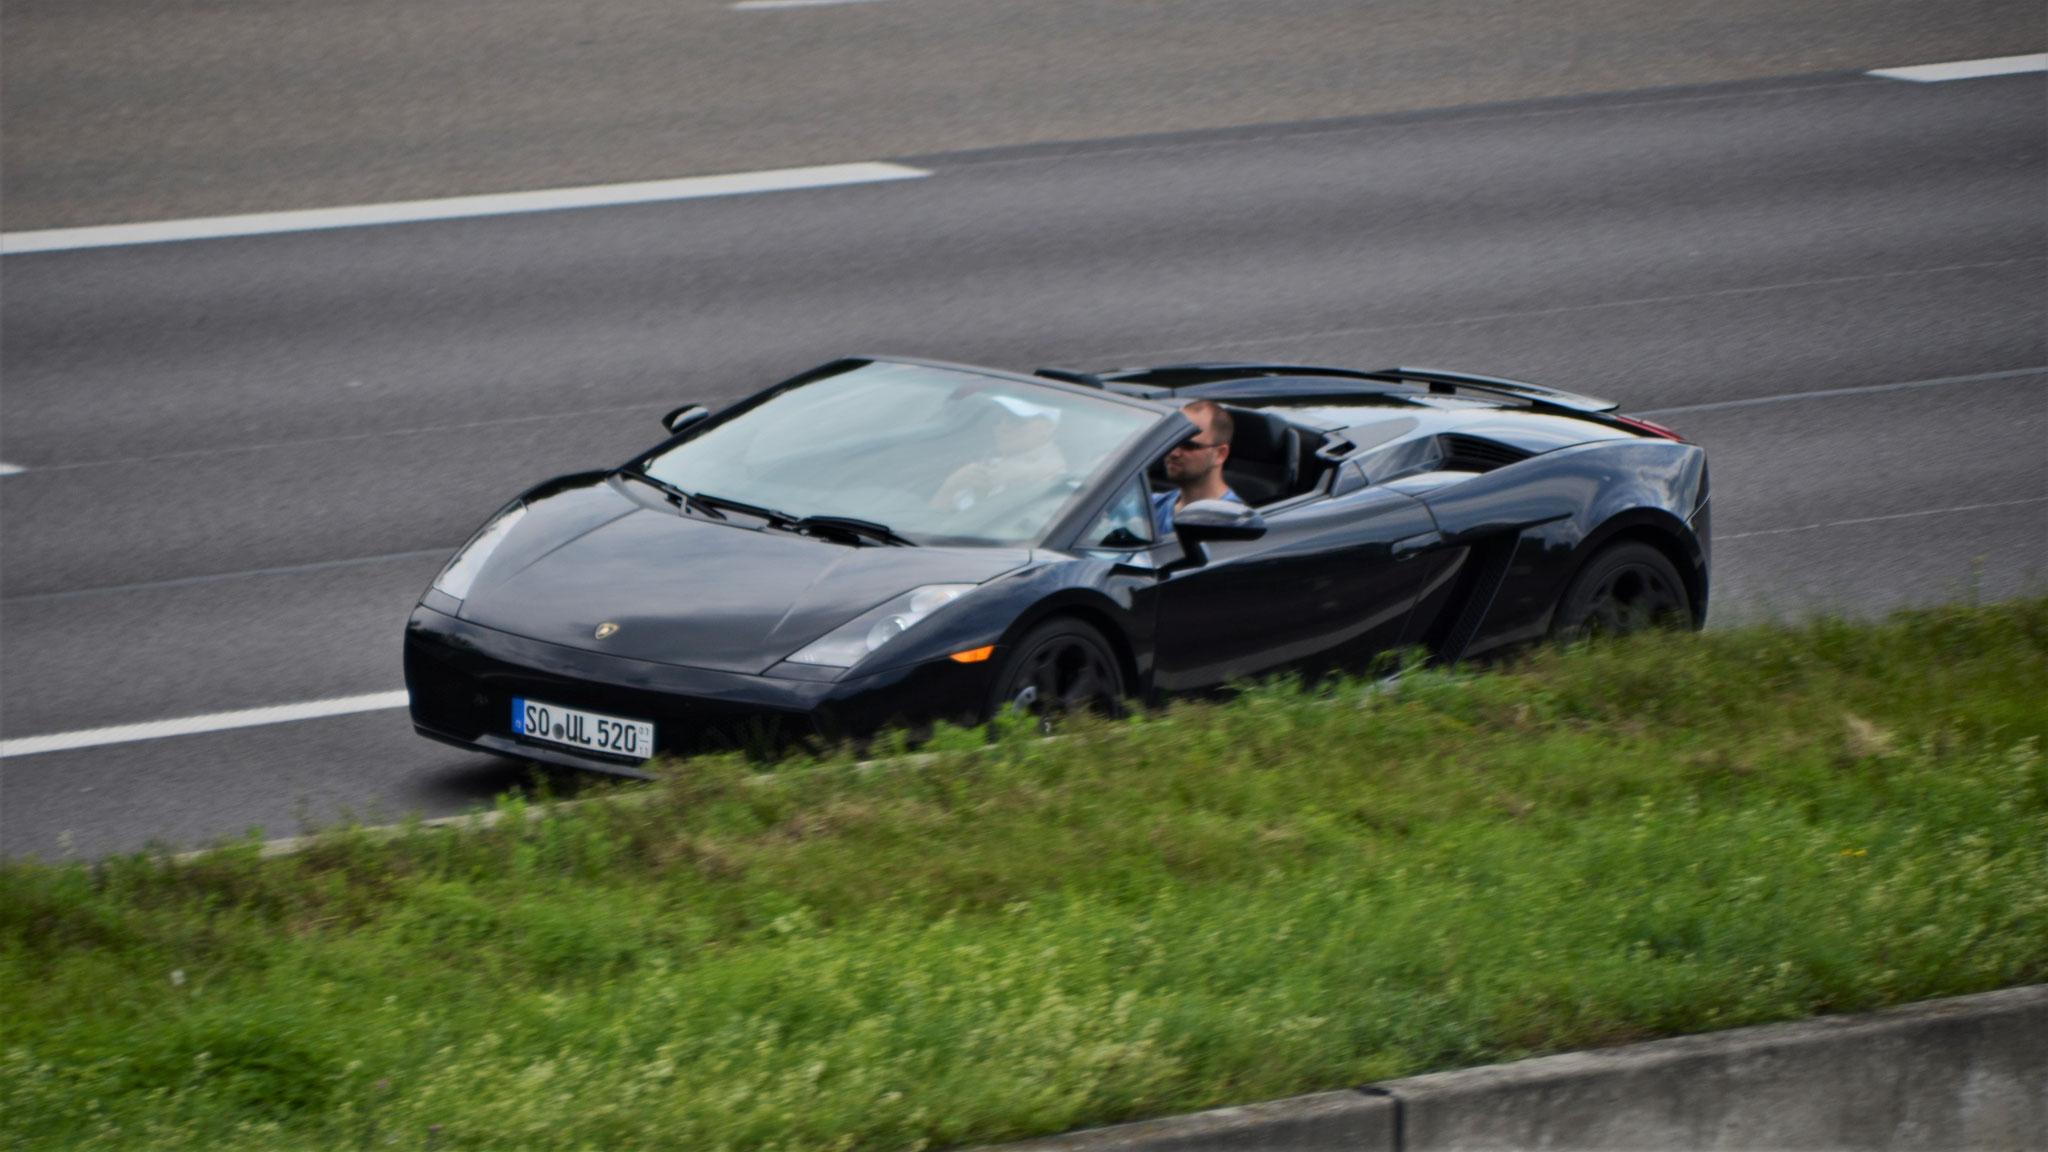 Lamborghini Gallardo LP 520 Spyder - SO-UL-520